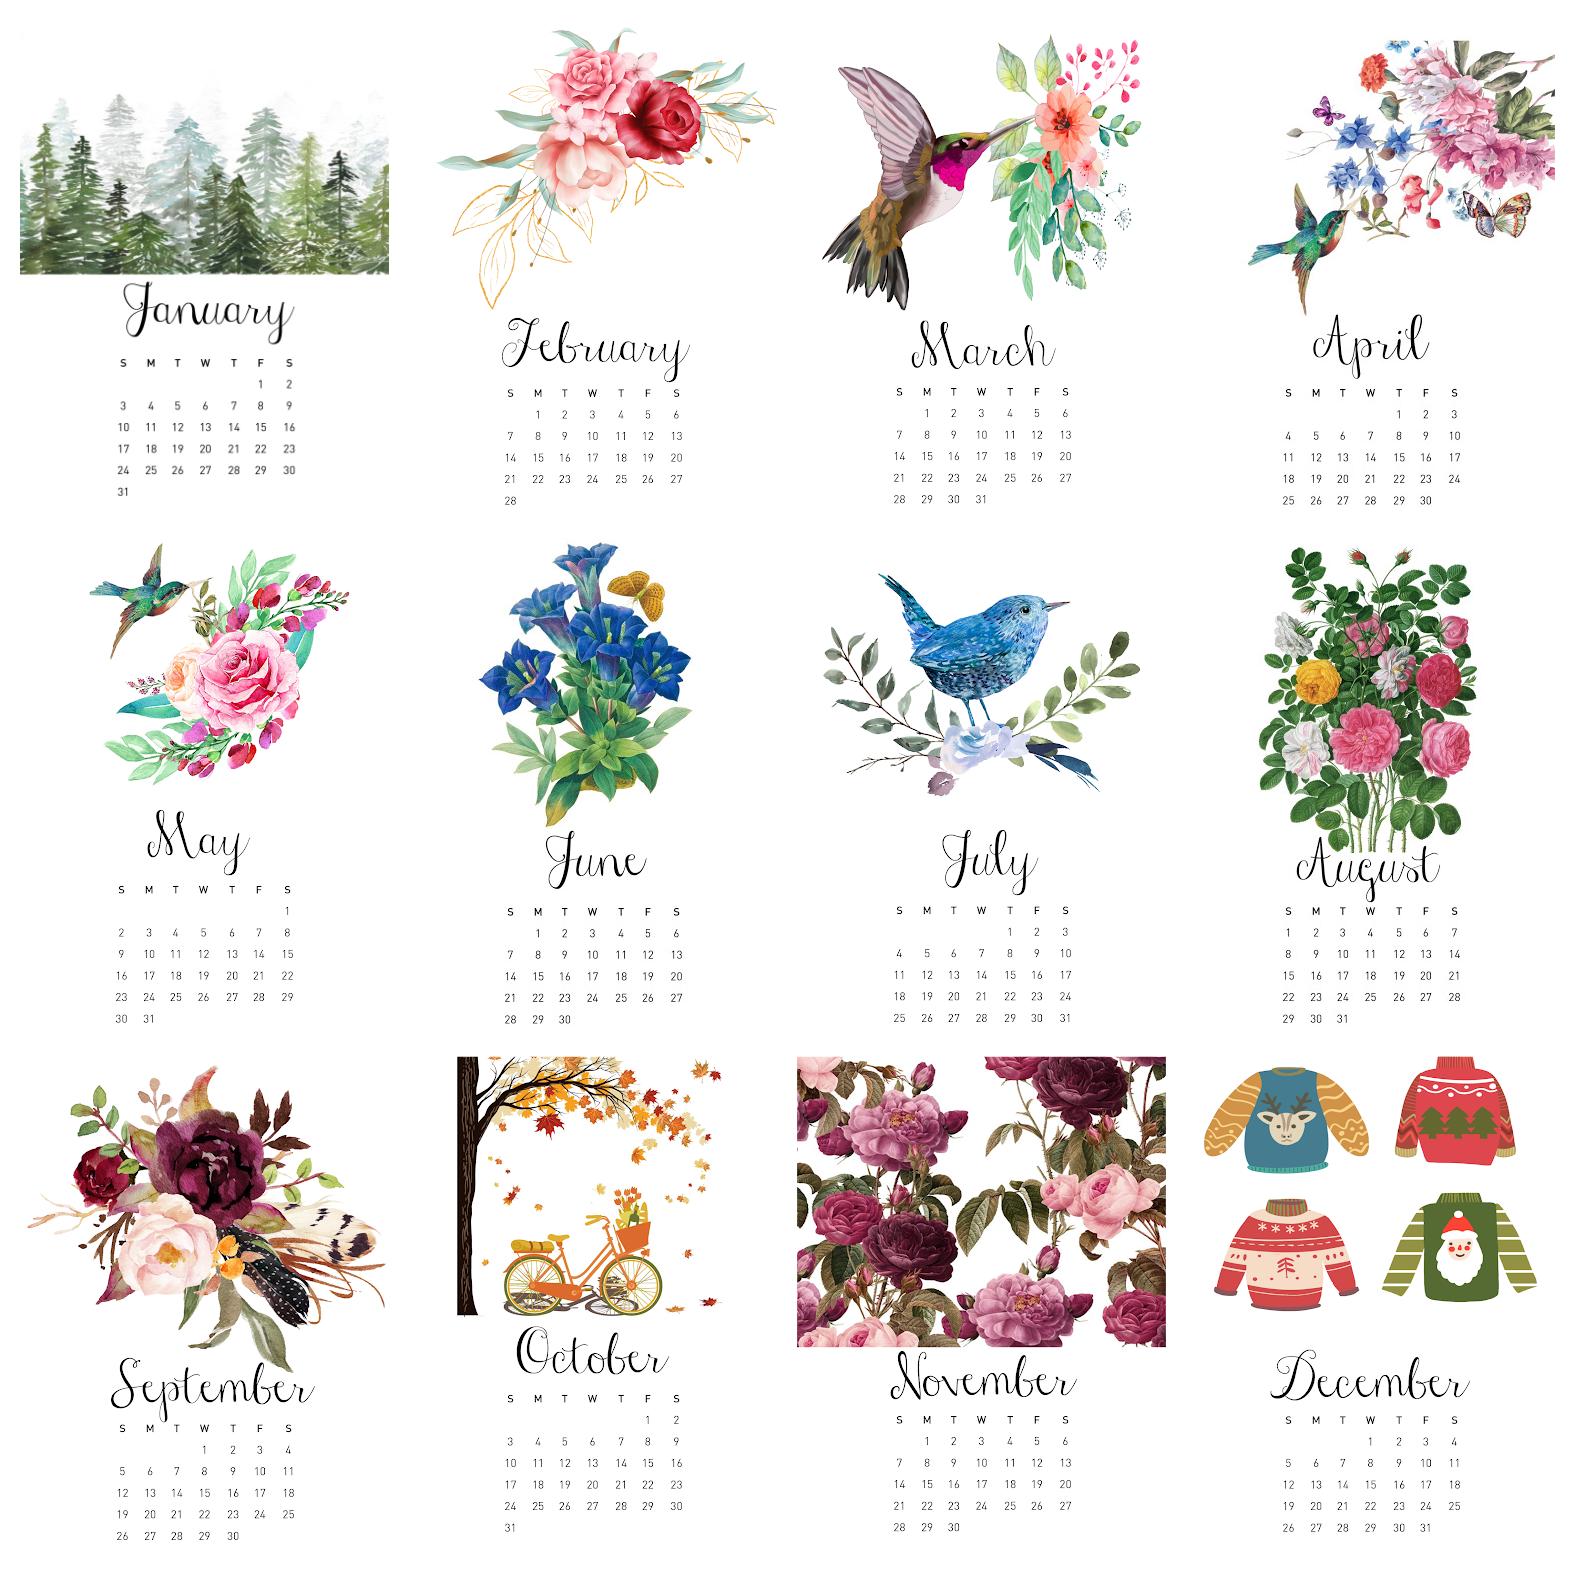 Free 2021 Calendar Printable – Plus $125 Gift Card Giveaway